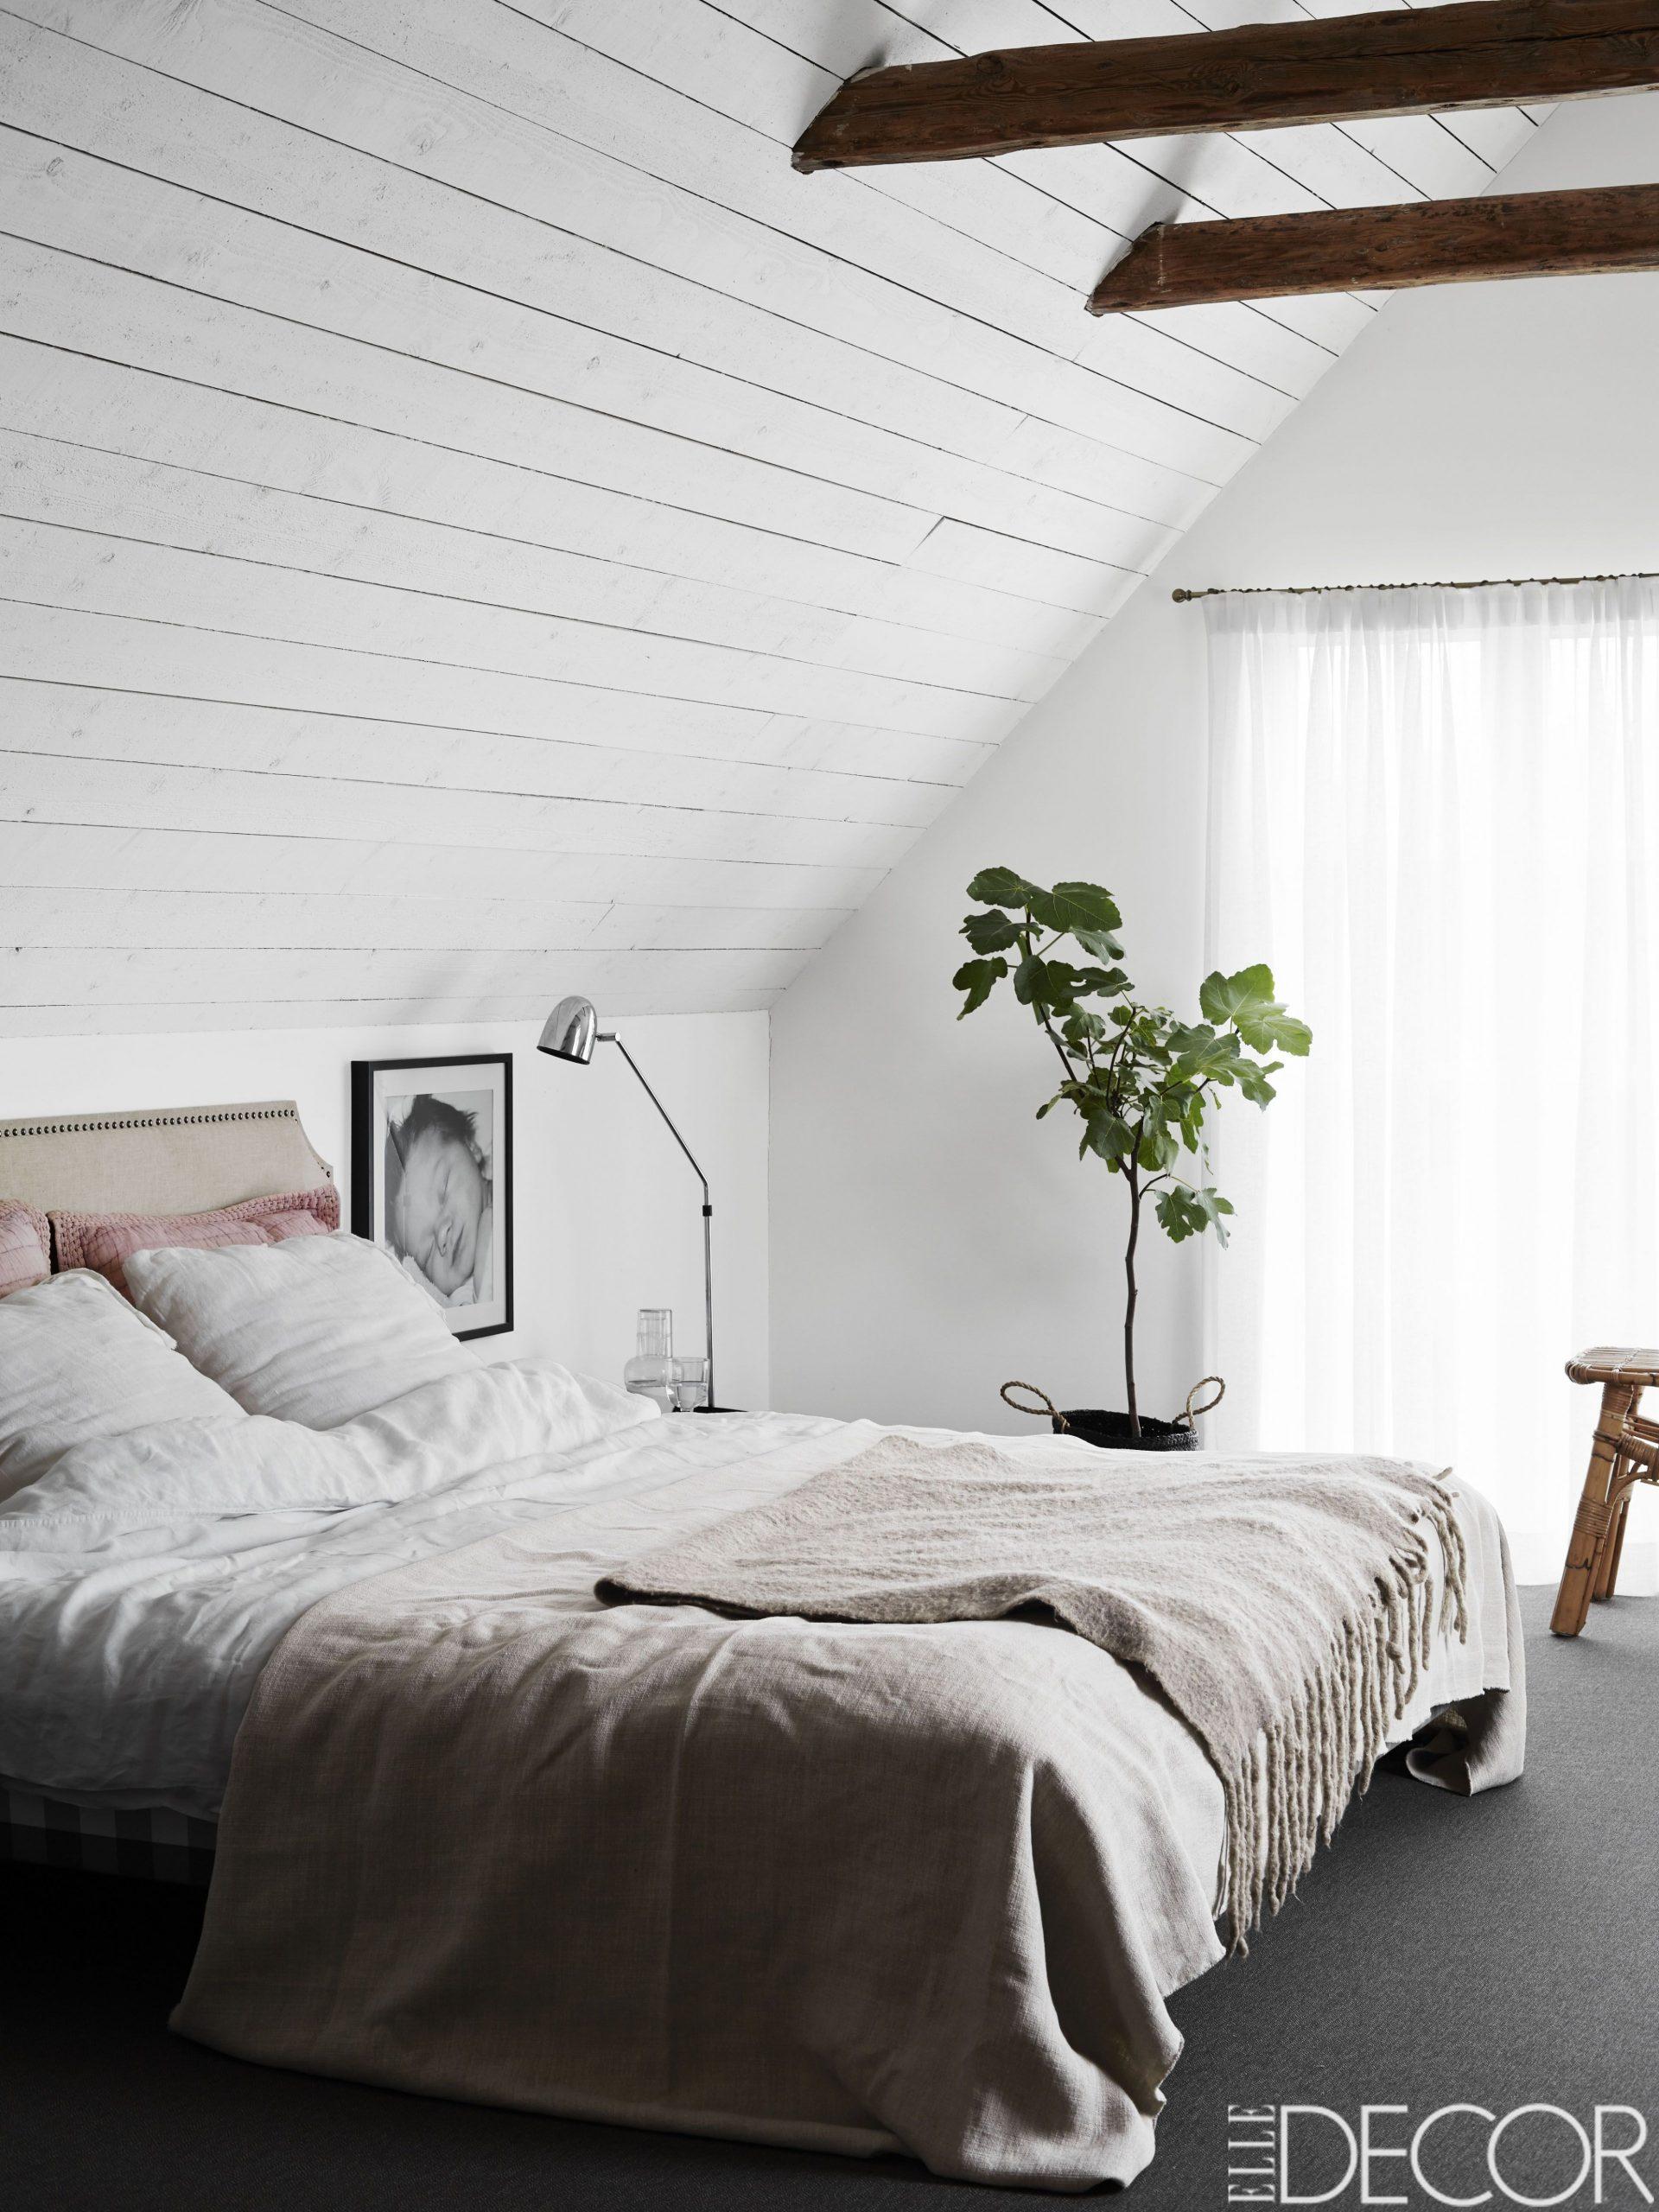 11 Minimalist Bedroom Decor Ideas - Modern Designs for Minimalist  - Bedroom Ideas Minimalist